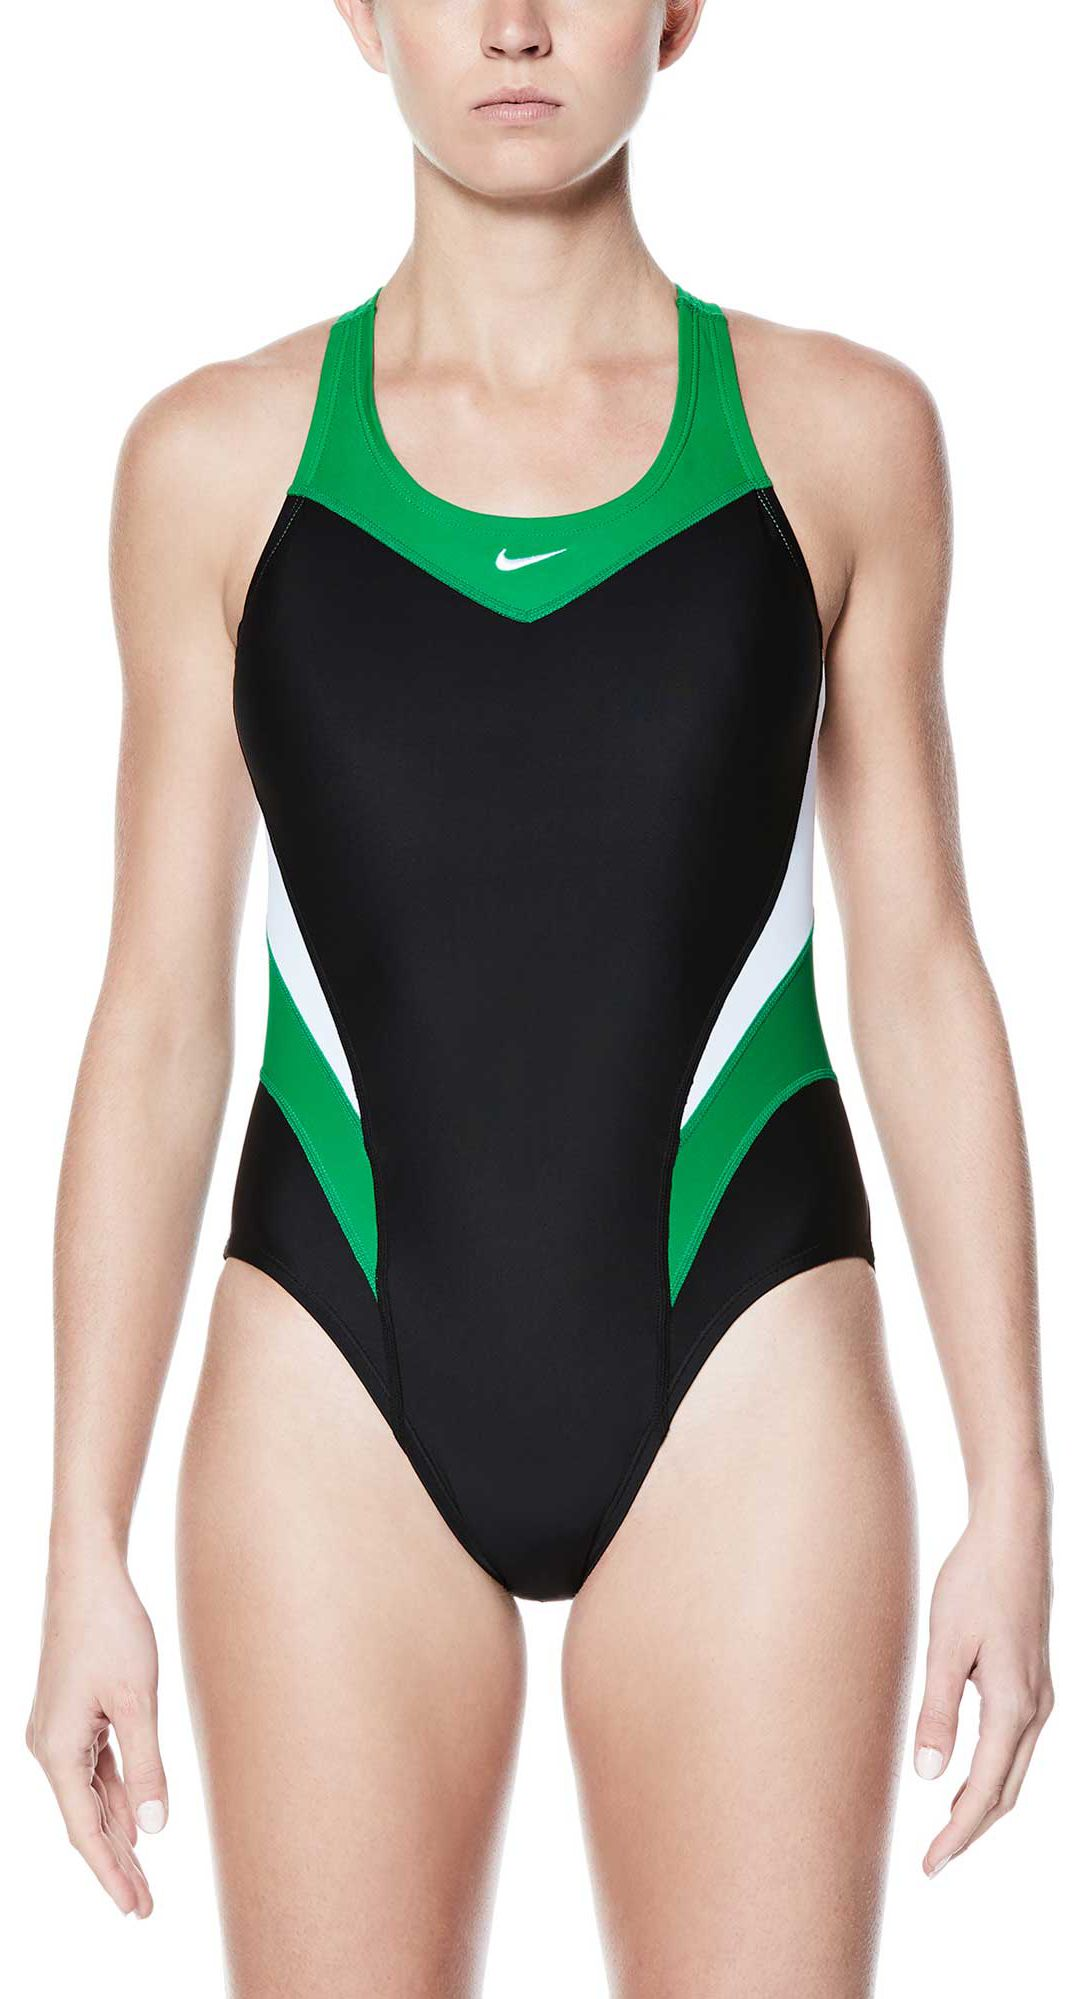 9e76b520a3 Nike Women's Victory Color Block Power Back Tank Swimsuit | DICK'S ...